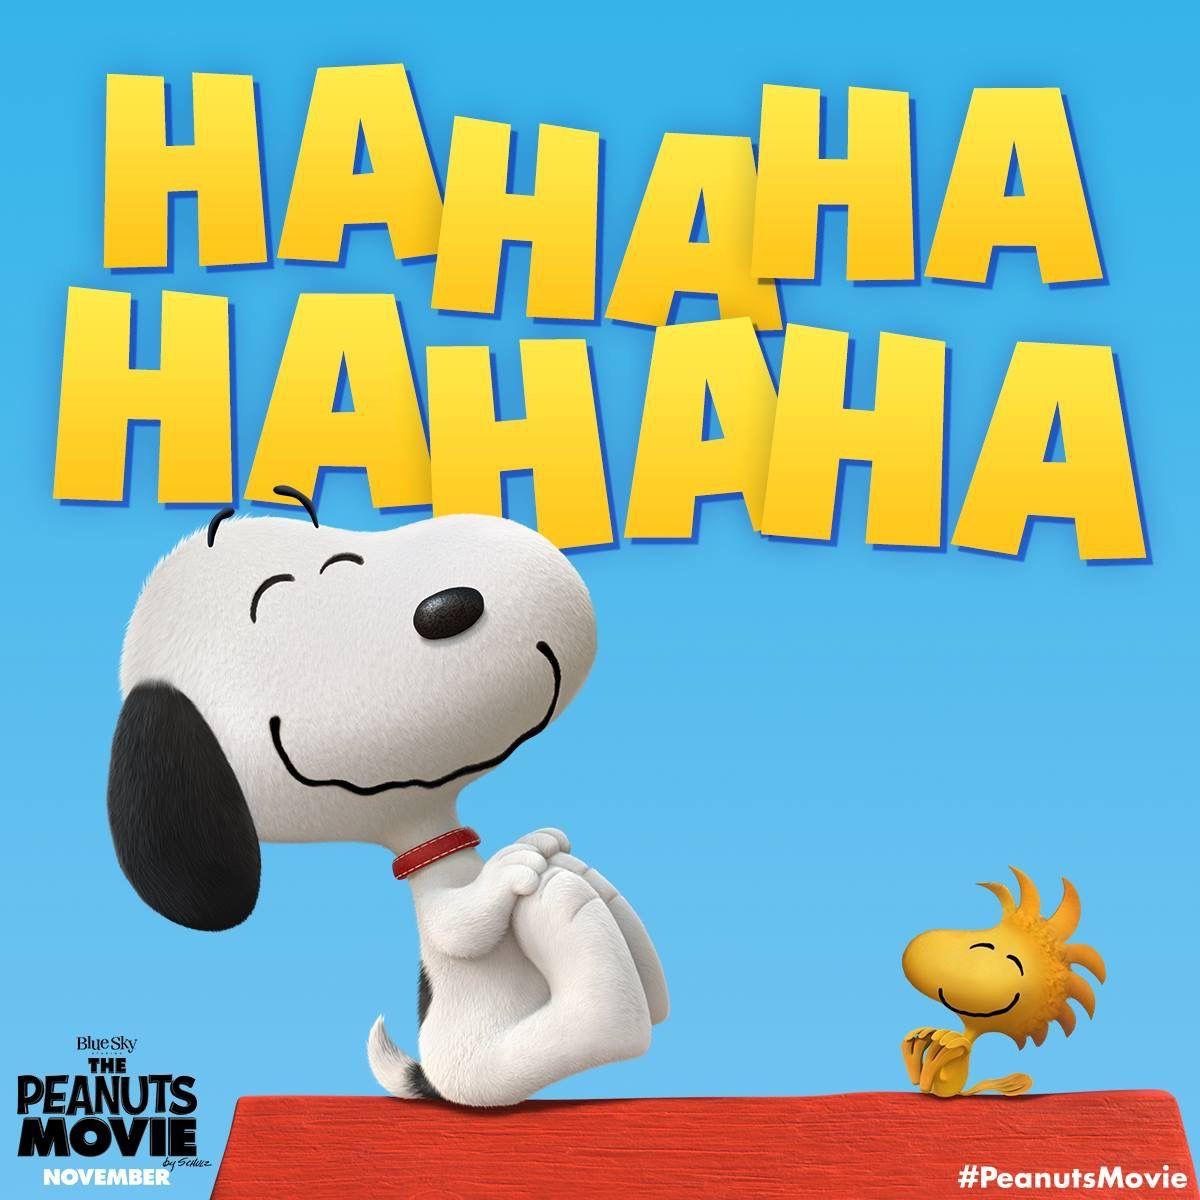 ️ Snoopy Peanuts Thegang Peanutsgang Schulz